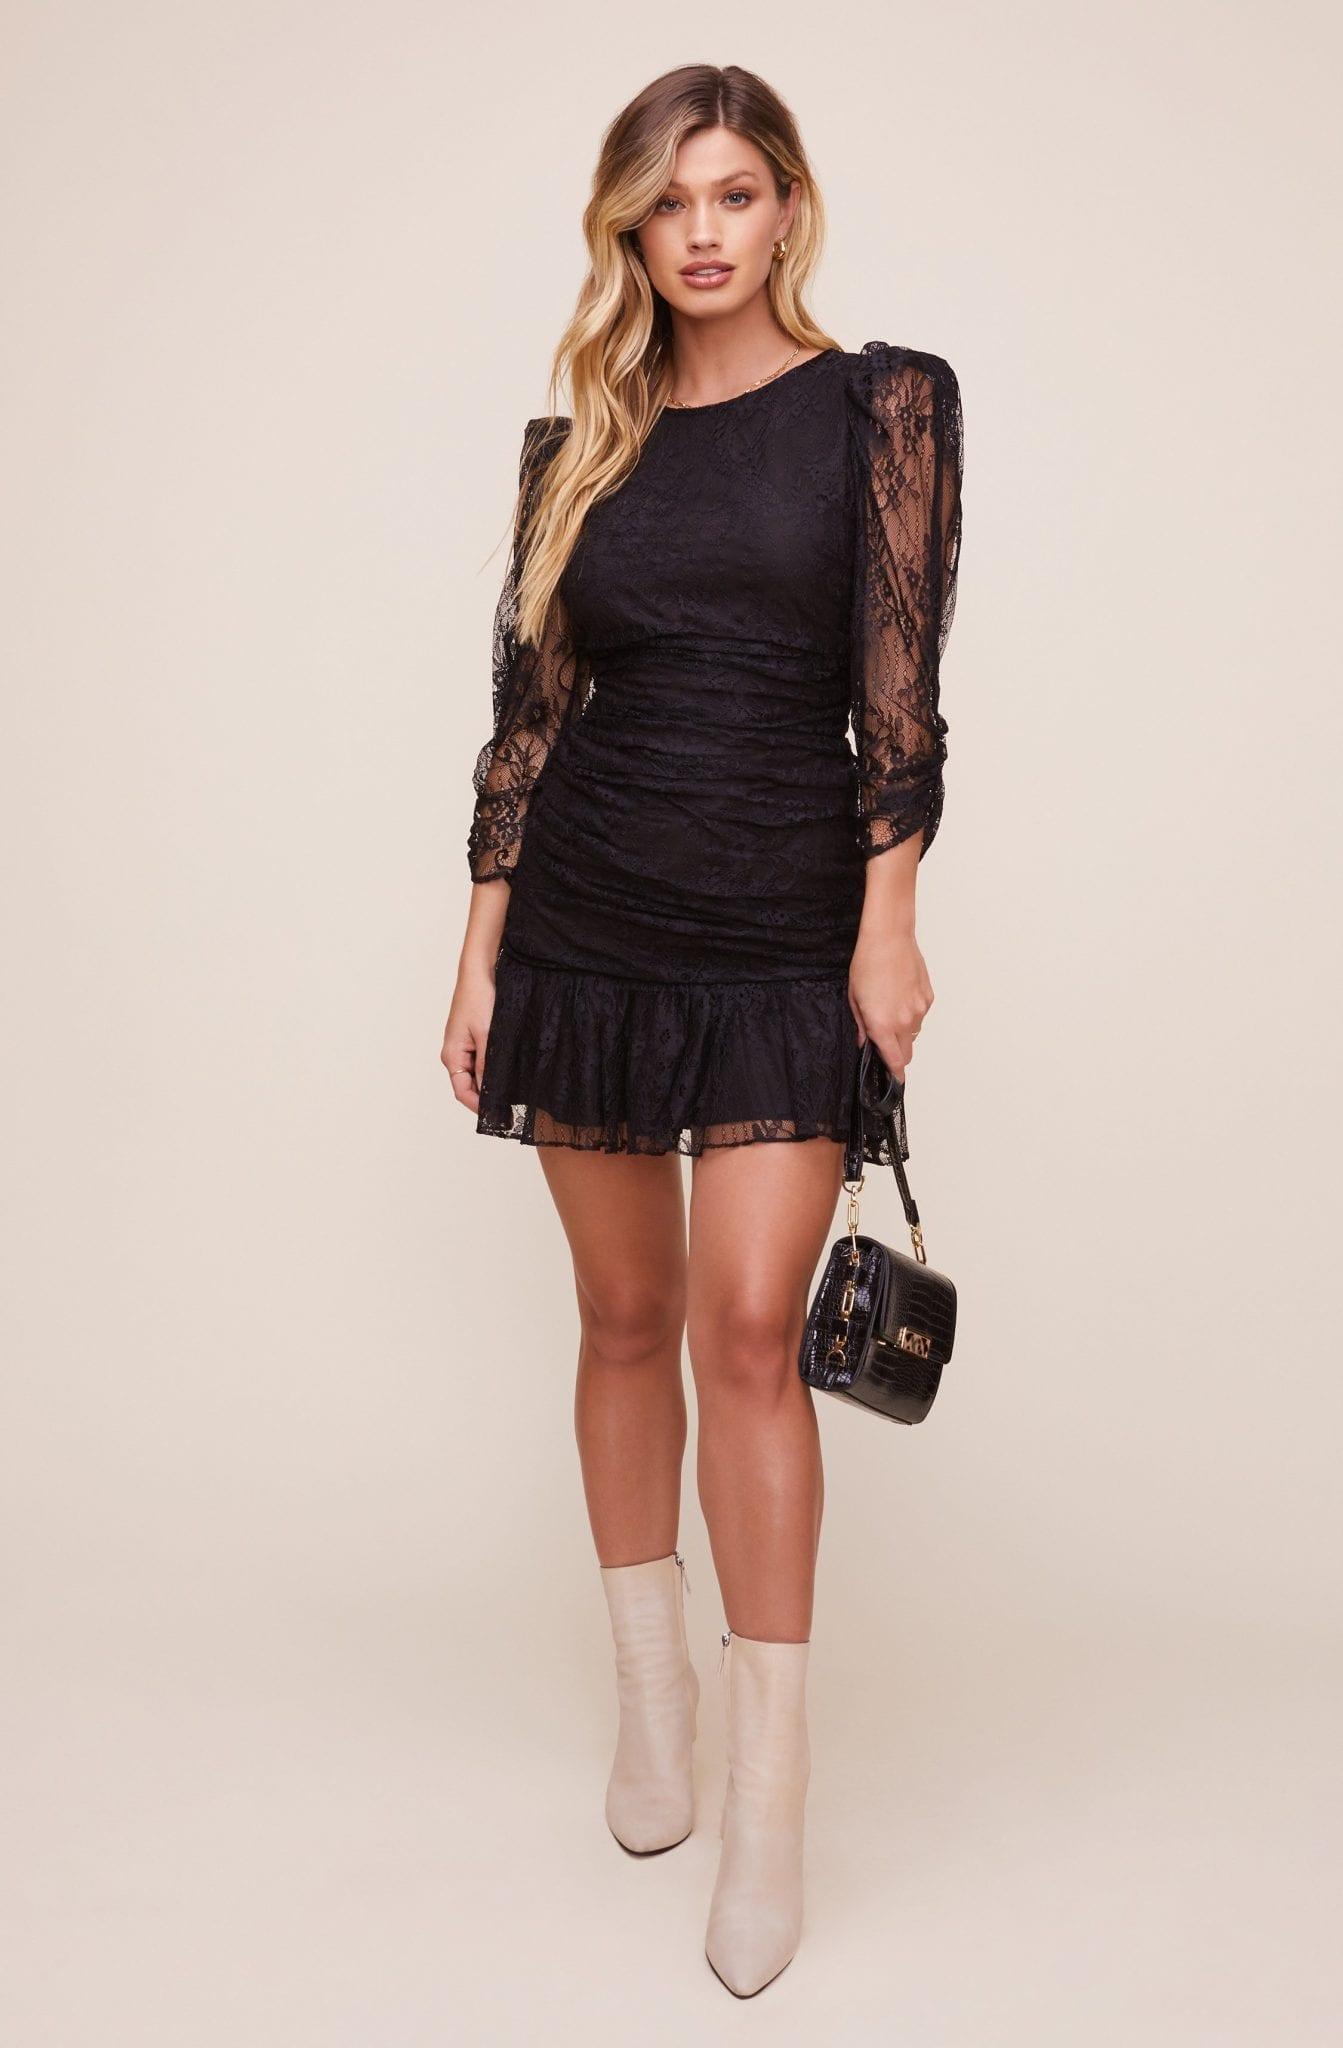 ASTRTHELABEL Rosalind Lace Mini Dress